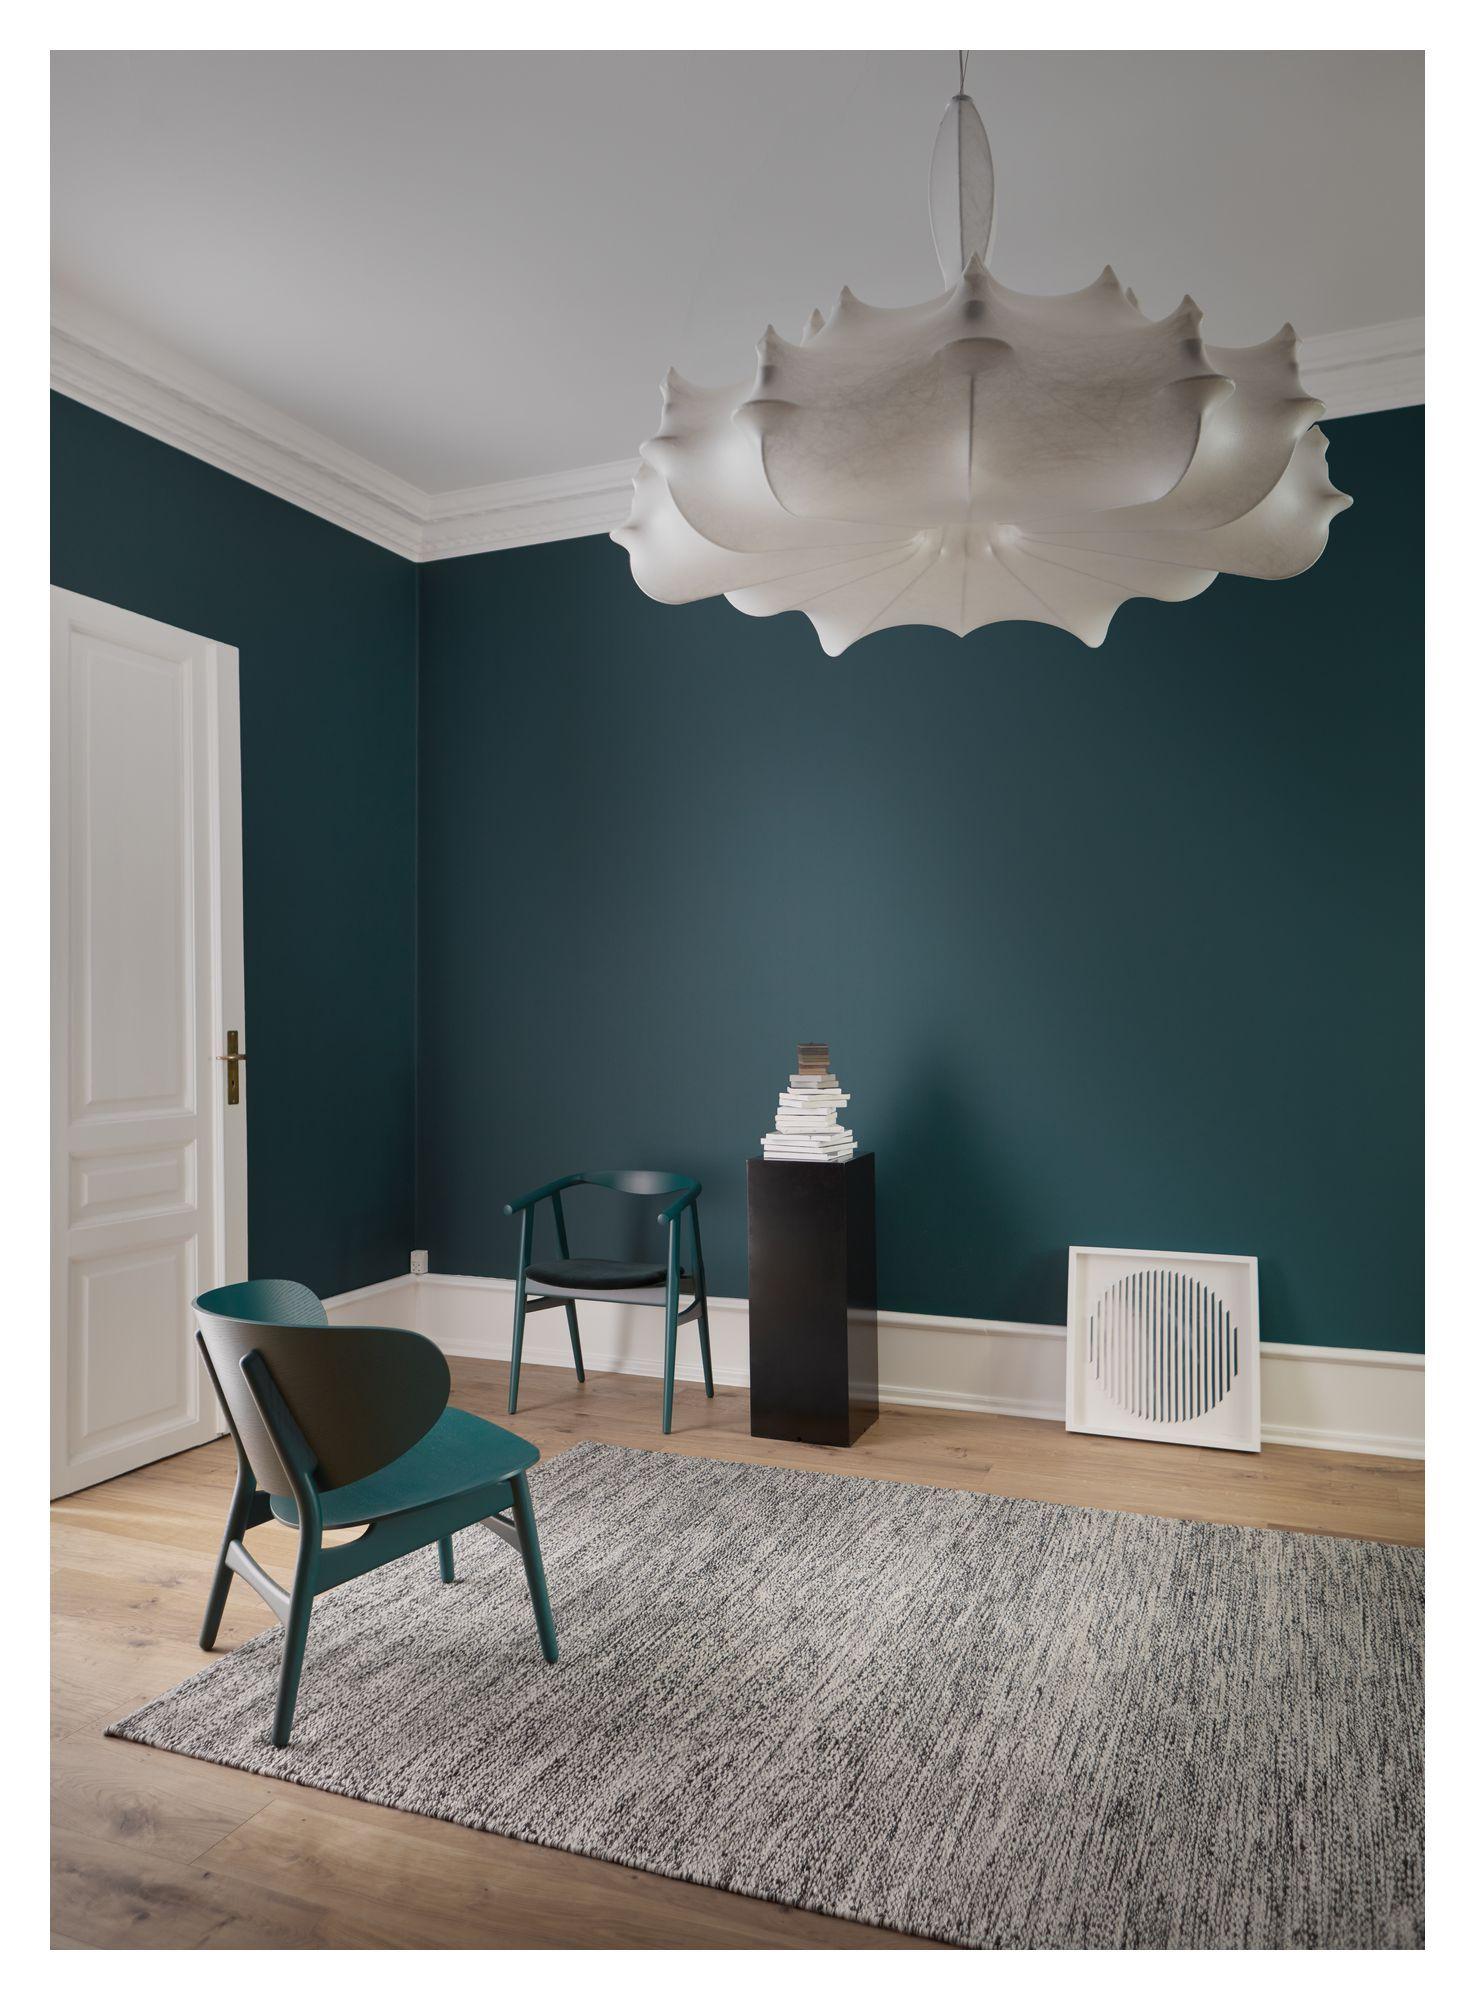 Fabula Living Gimle Kelim Offwhite/Sort, 200x300